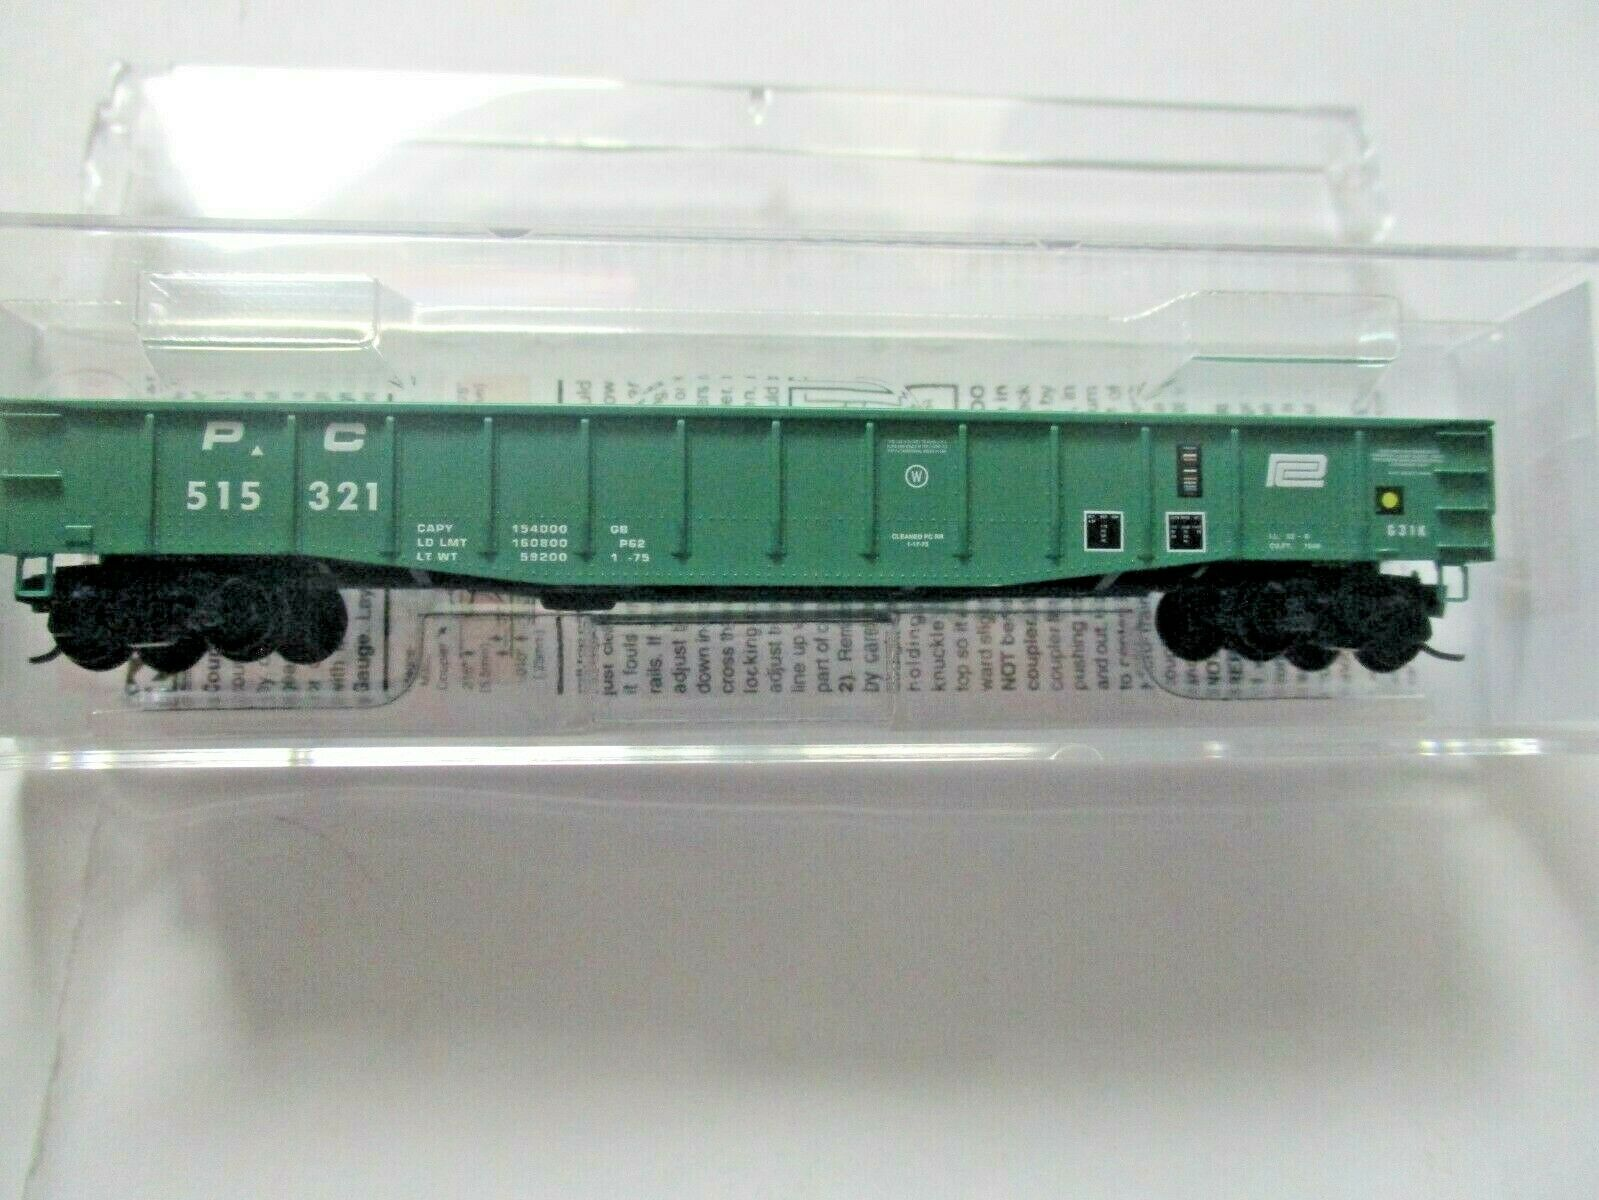 Micro-Trains # 10500350 Penn Central 50' Steel Side Gondola, 14 Panel N-Scale